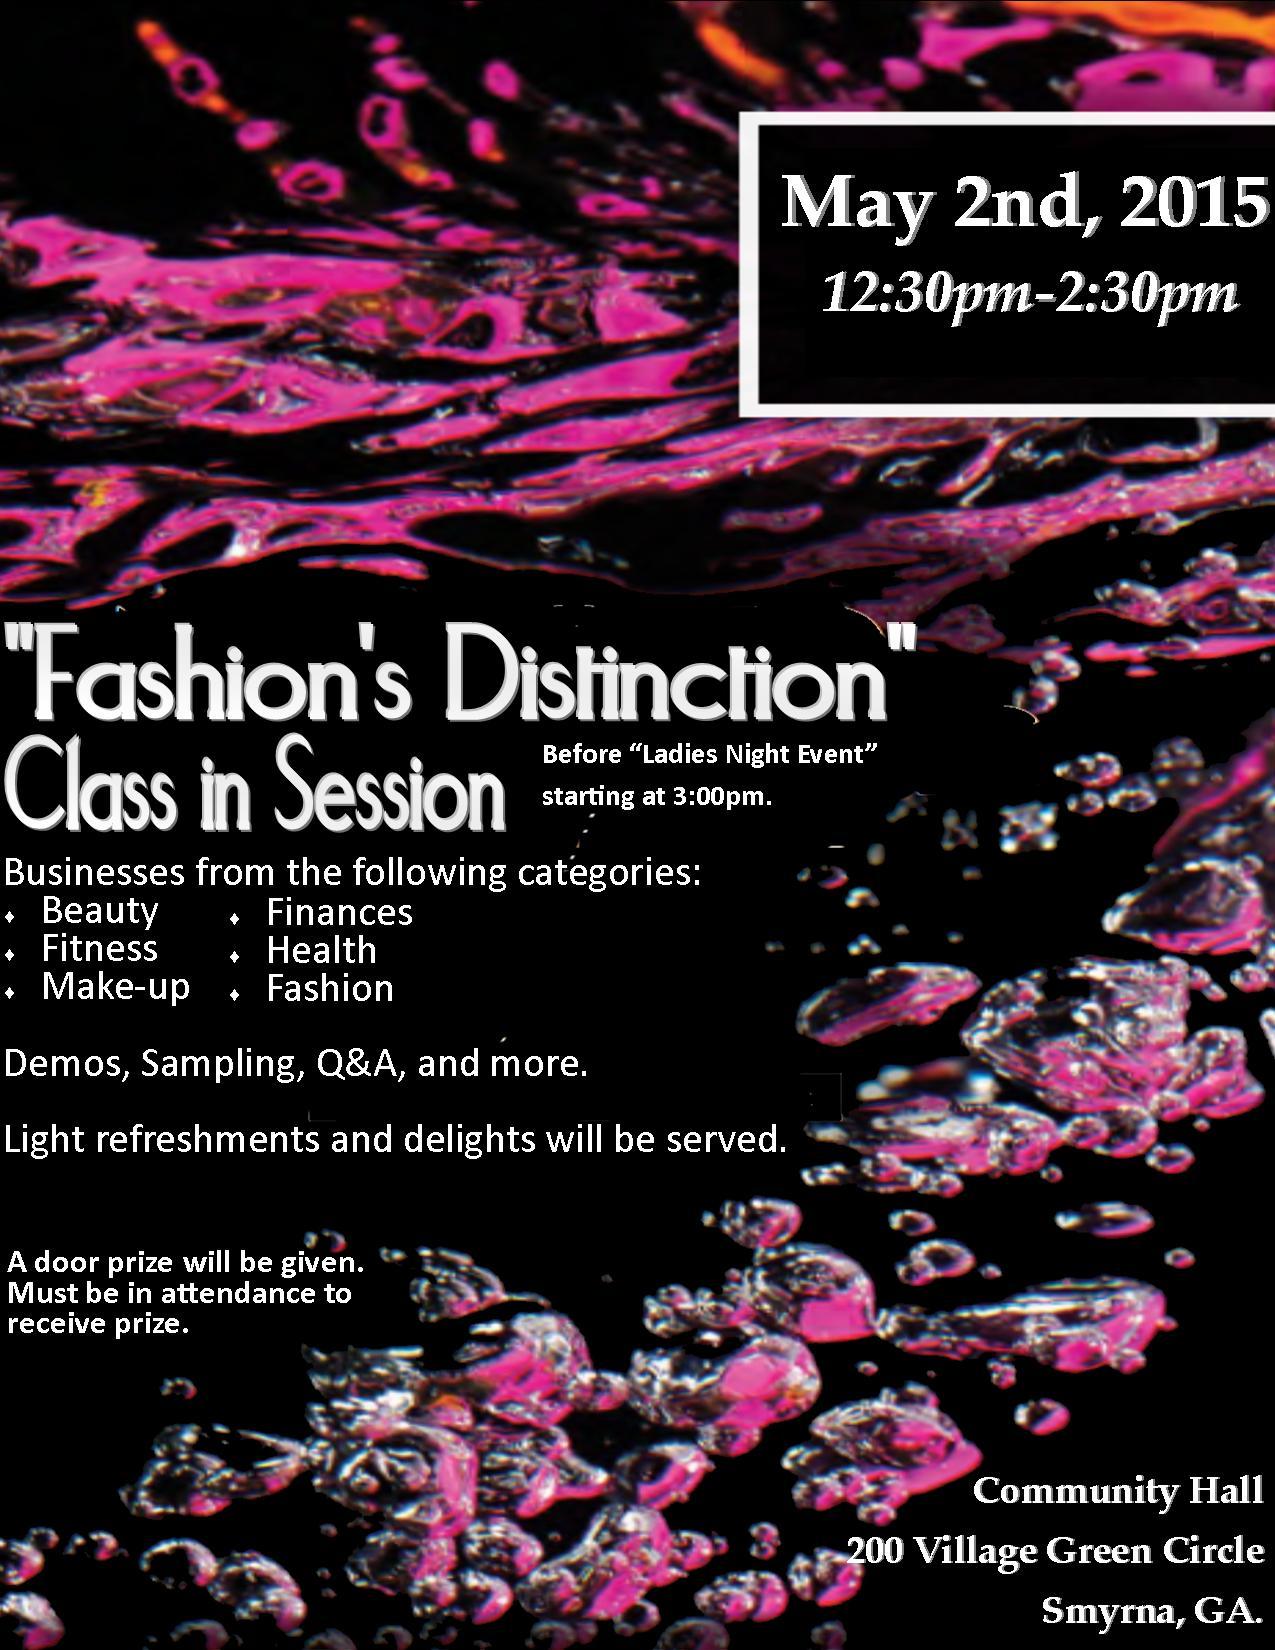 info@fashionsdistinction.com